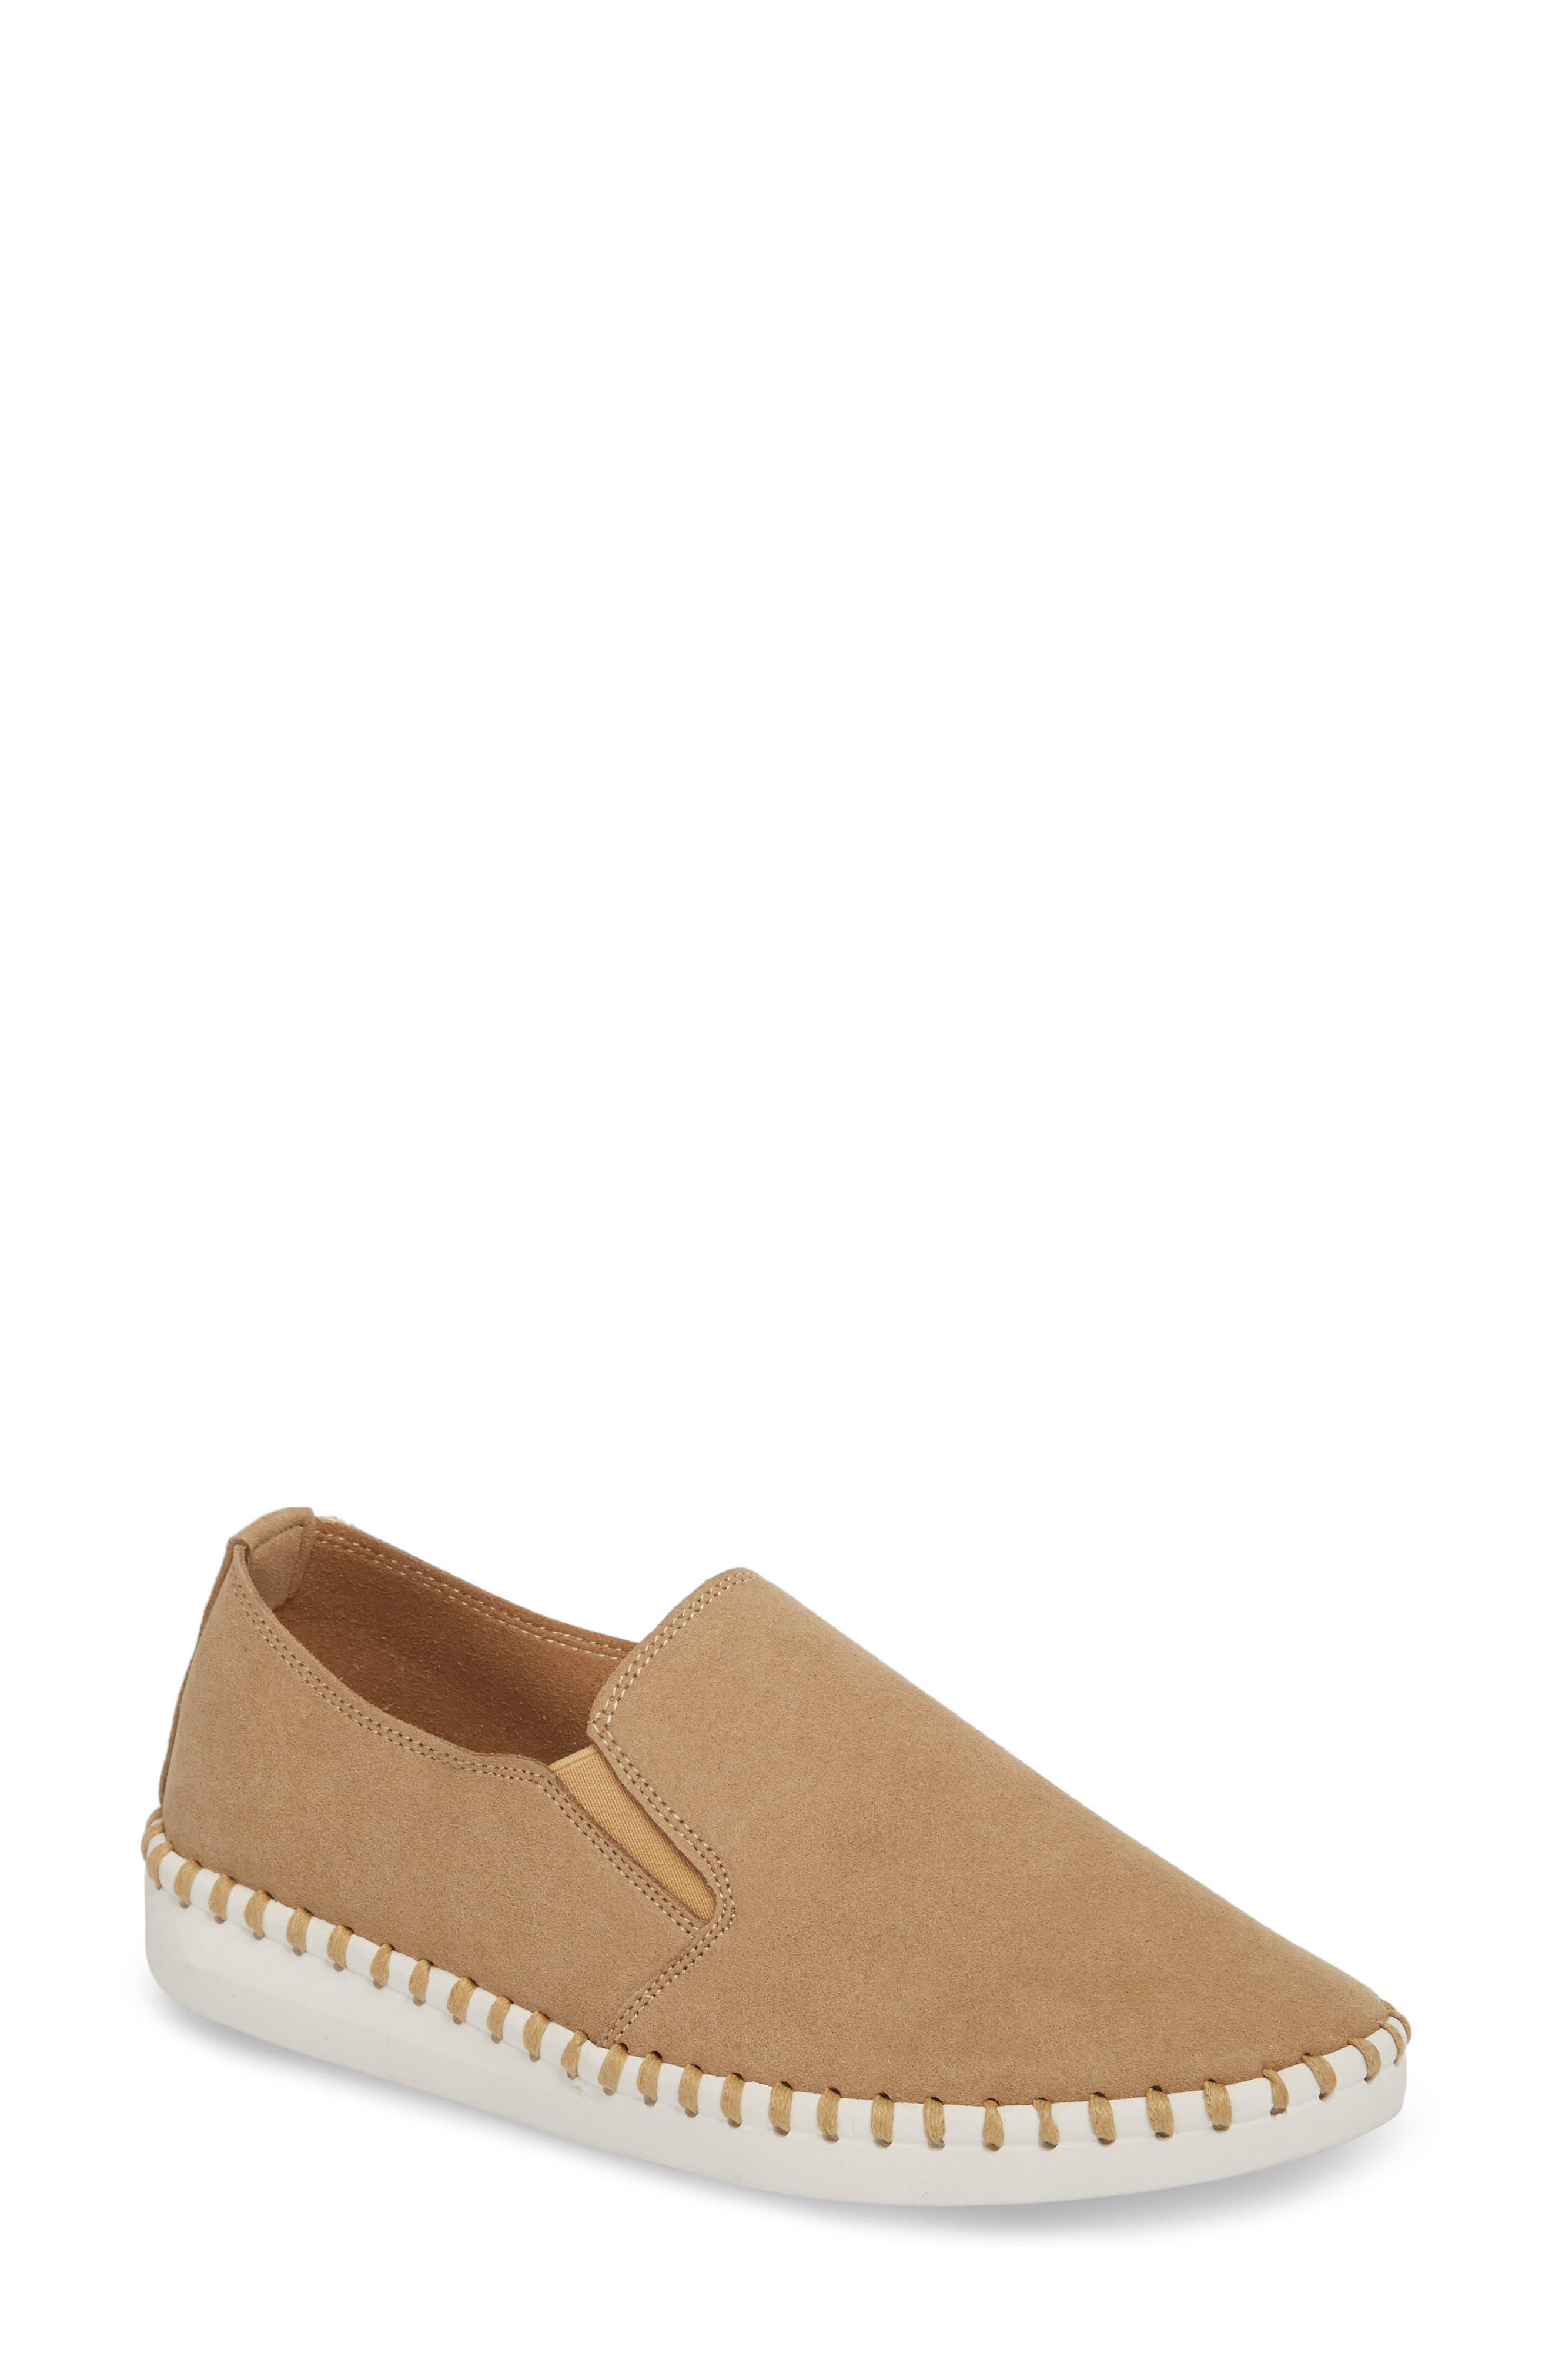 Salinas Waterproof Slip-On Sneaker,                         Main,                         color, Tan Fabric